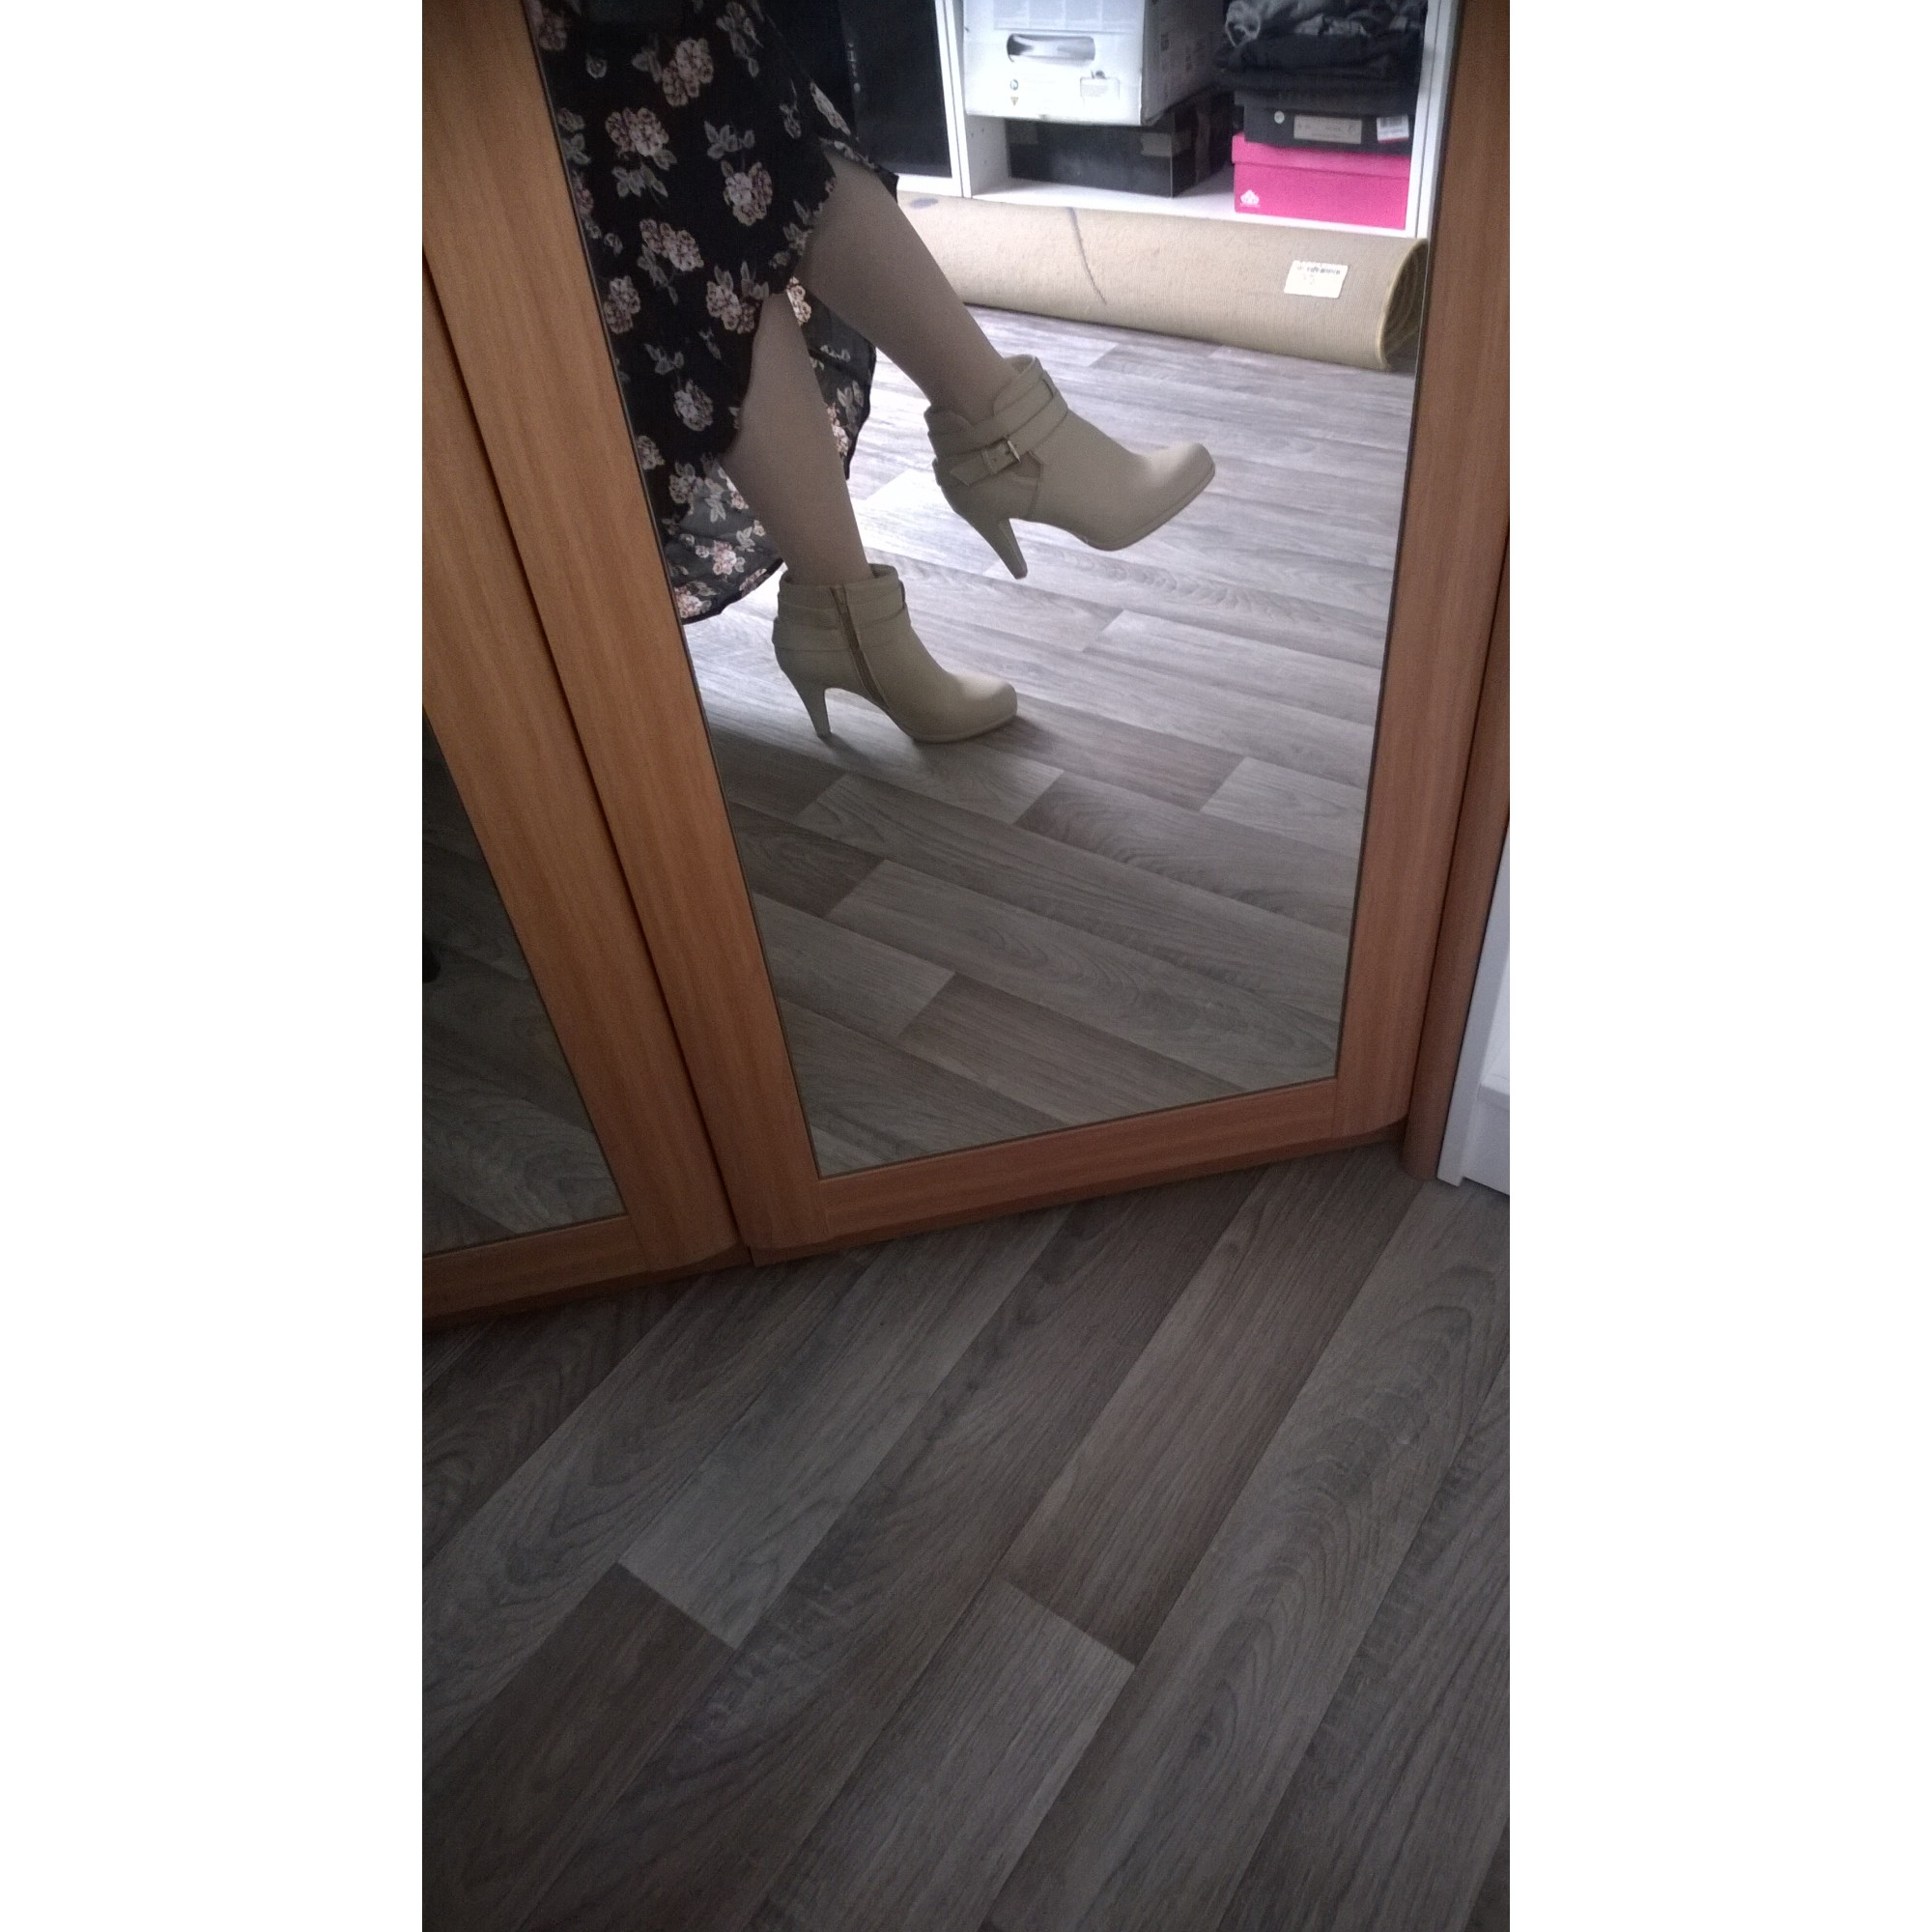 Bottines & low boots à talons ANNA FIELD Blanc, blanc cassé, écru